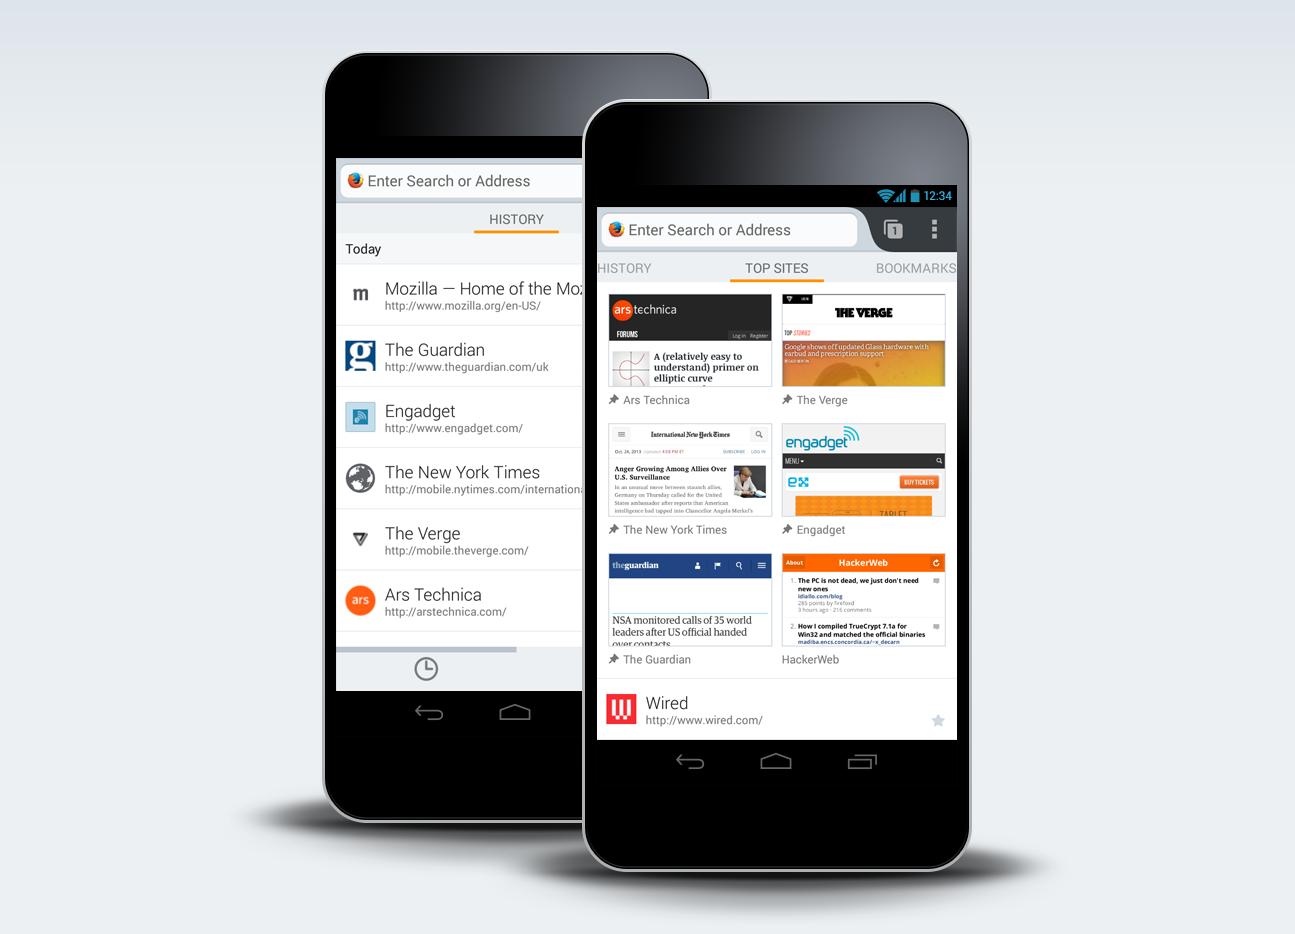 7 лучших дополнений Firefox для Android